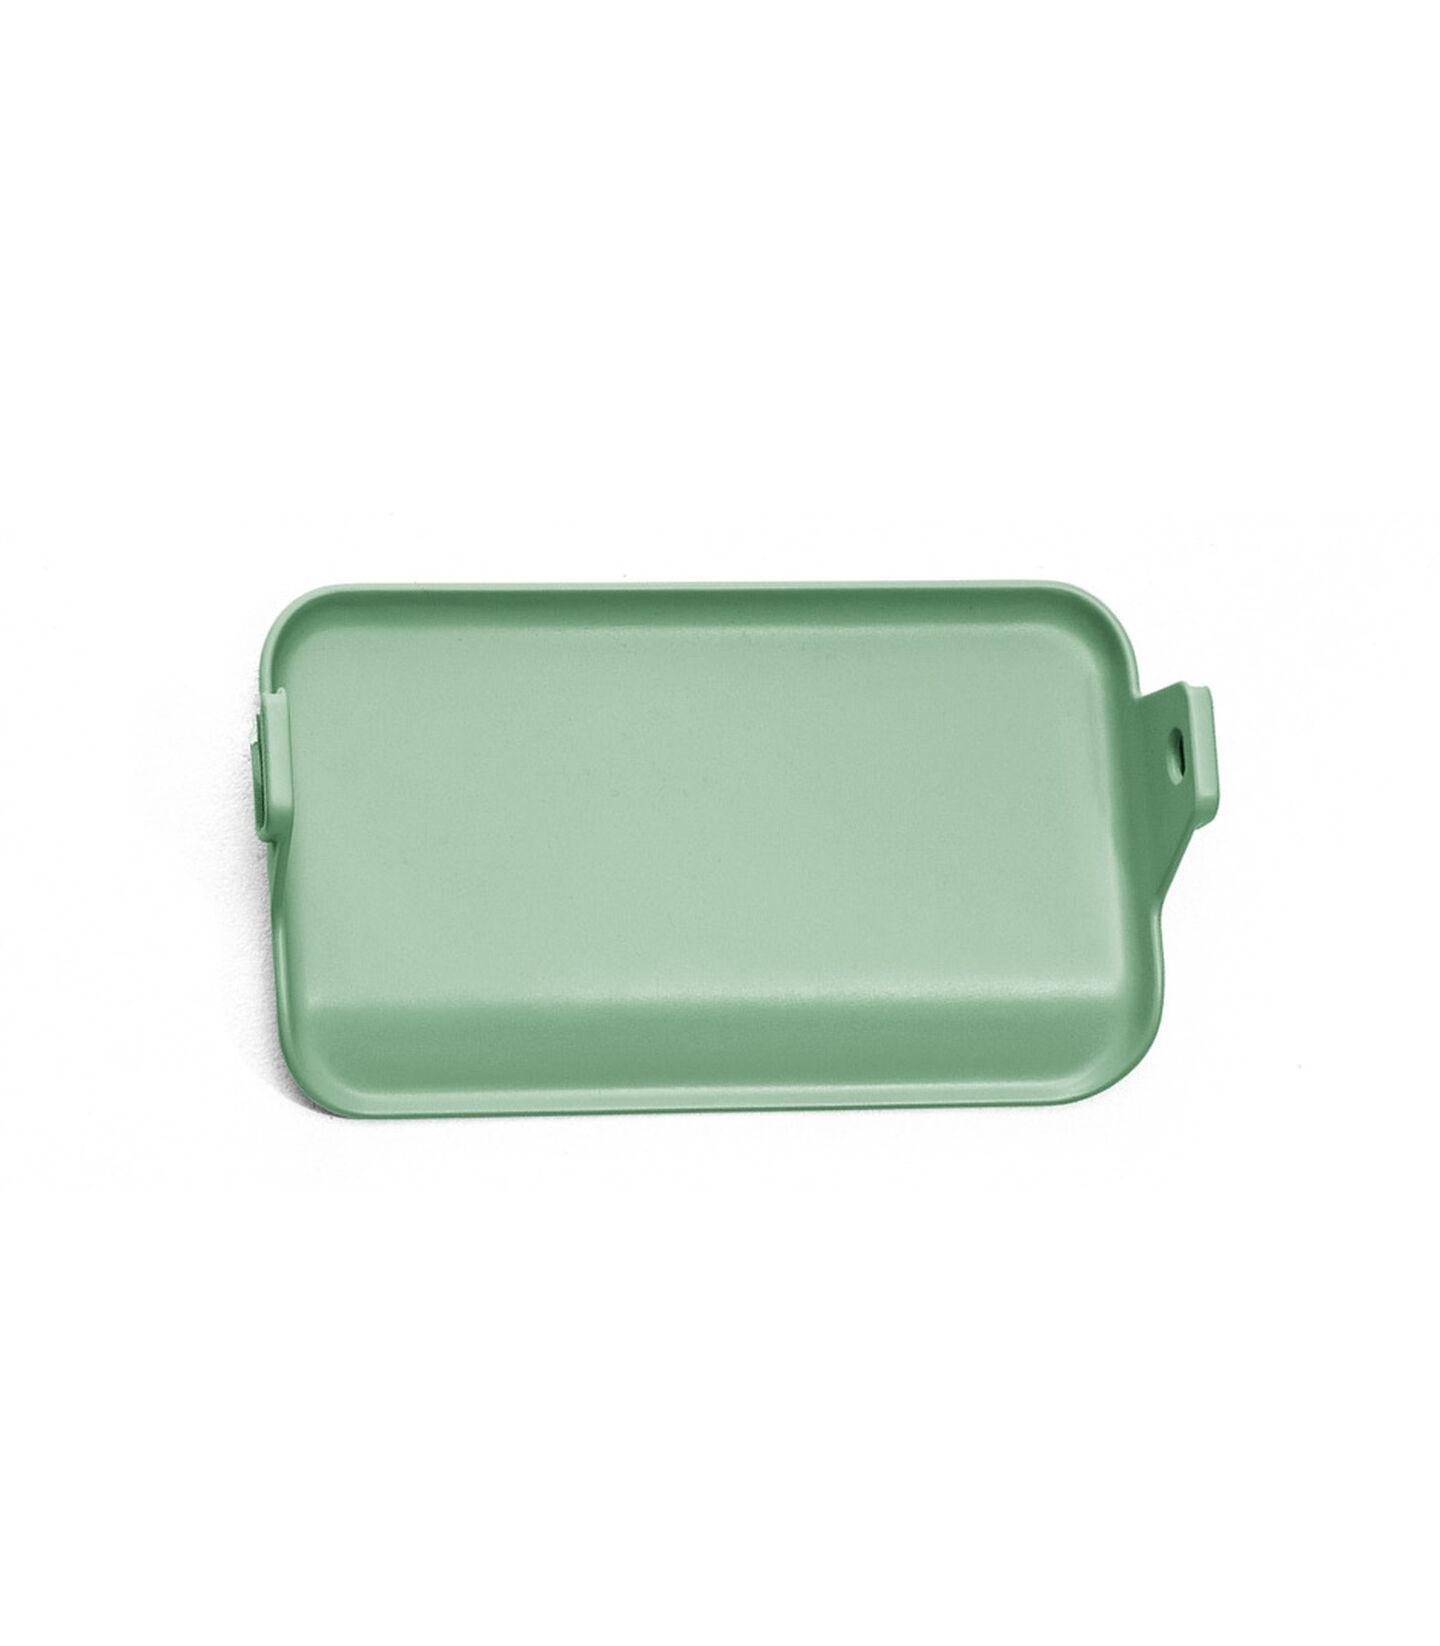 Stokke® Clikk™ Pedana Clover Green, Verde Trifoglio, mainview view 1